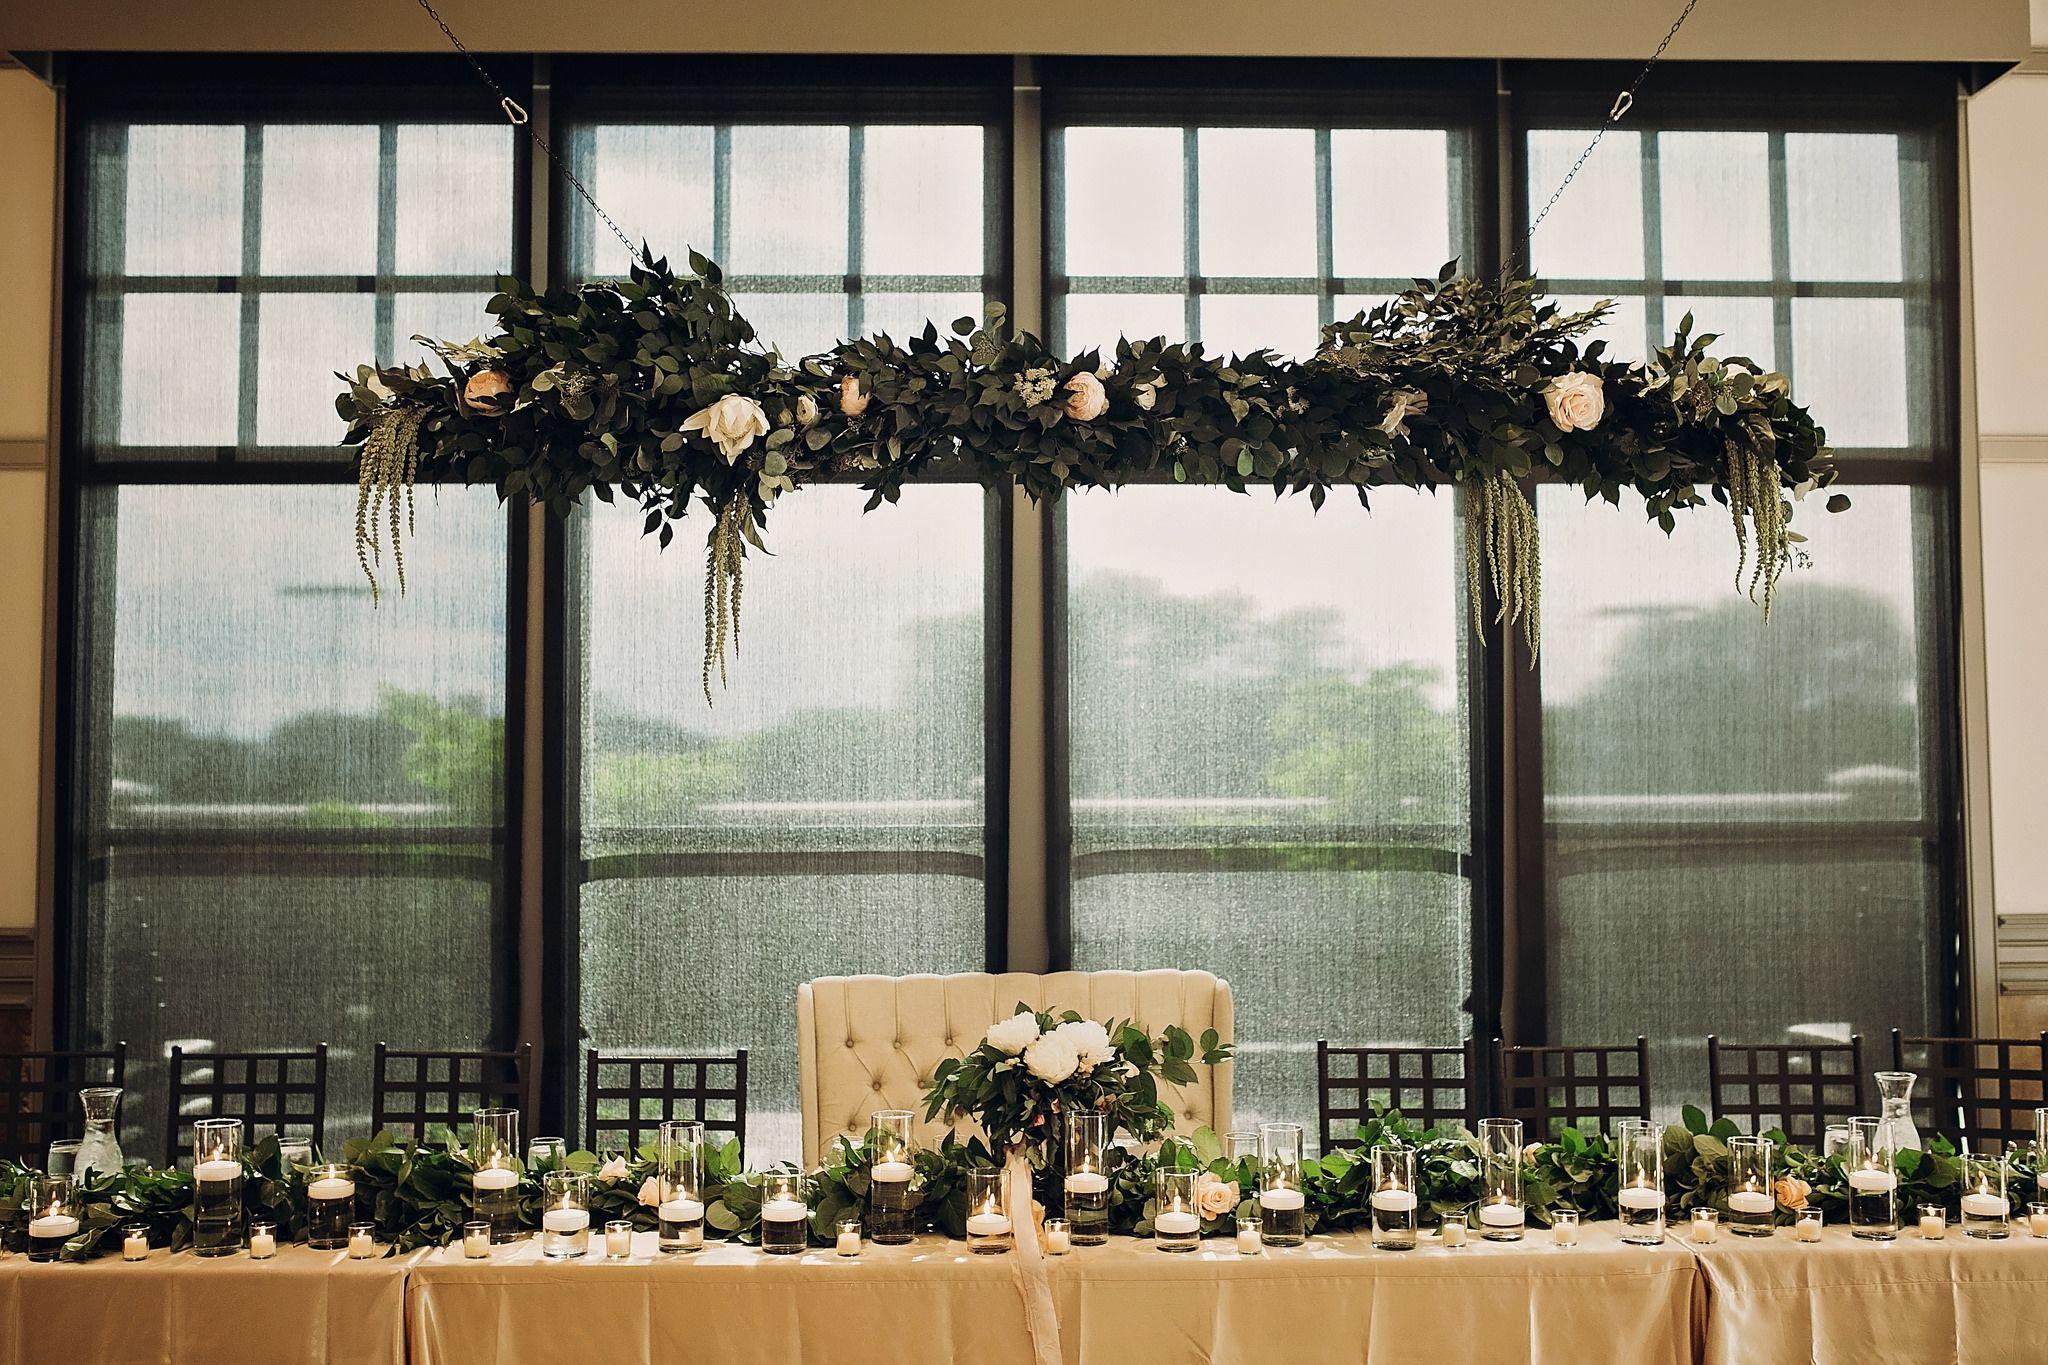 A Hip Boho Wedding At Noah S In Omaha Ne Noahs Event Venue Event Venues Wedding Rustic Bohemian Wedding